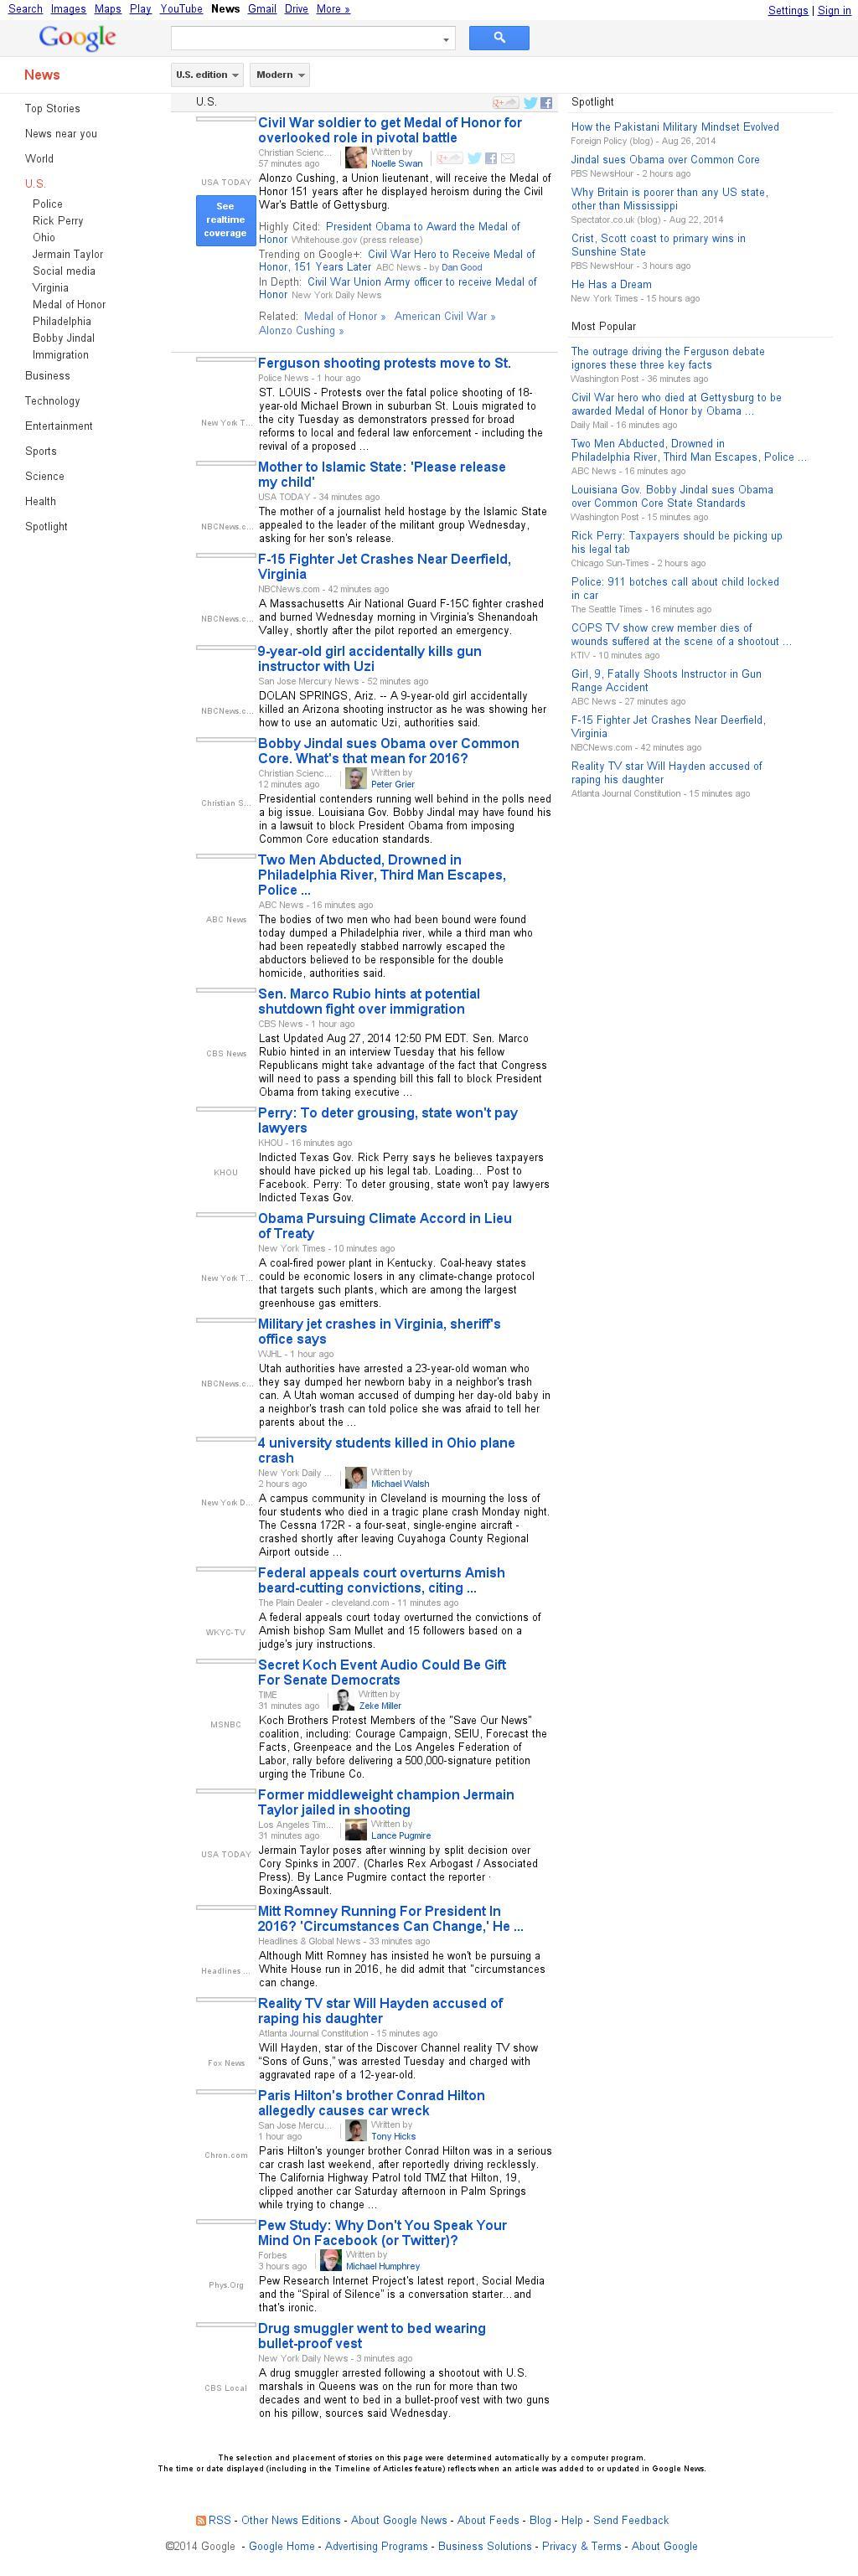 Google News: U.S. at Wednesday Aug. 27, 2014, 5:07 p.m. UTC